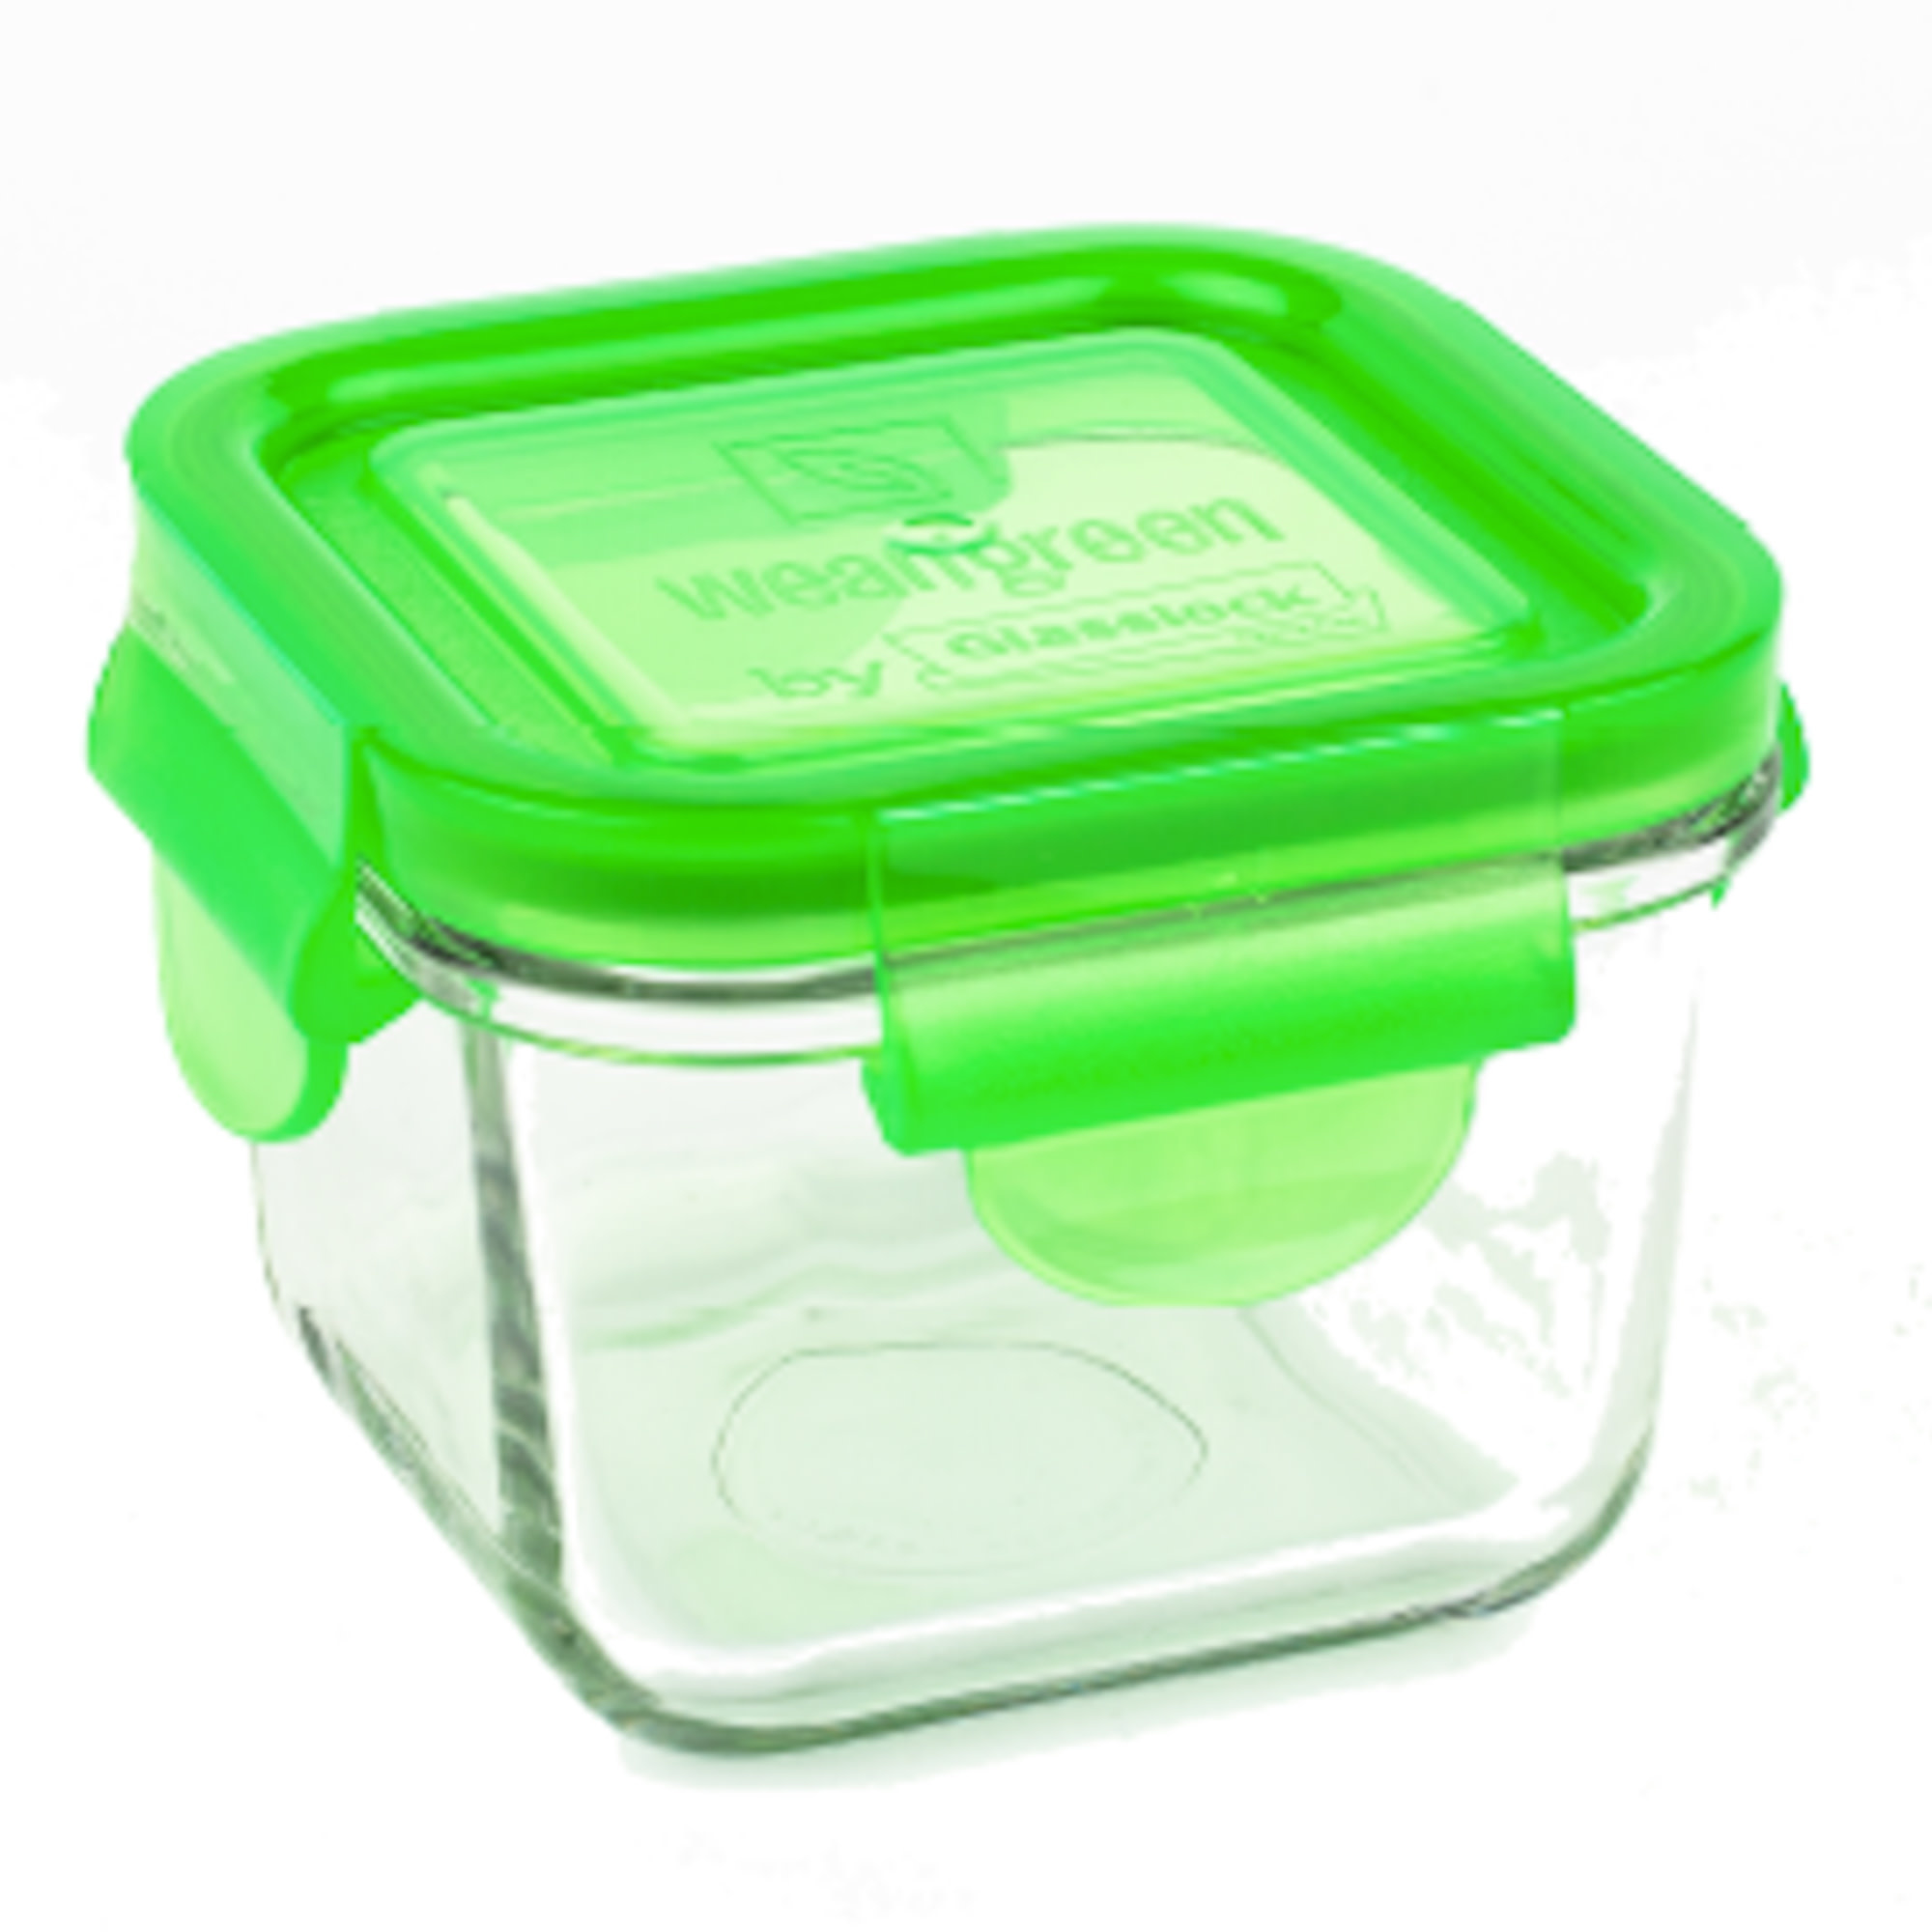 Wean Green 7 oz. Snack Cube - Pea